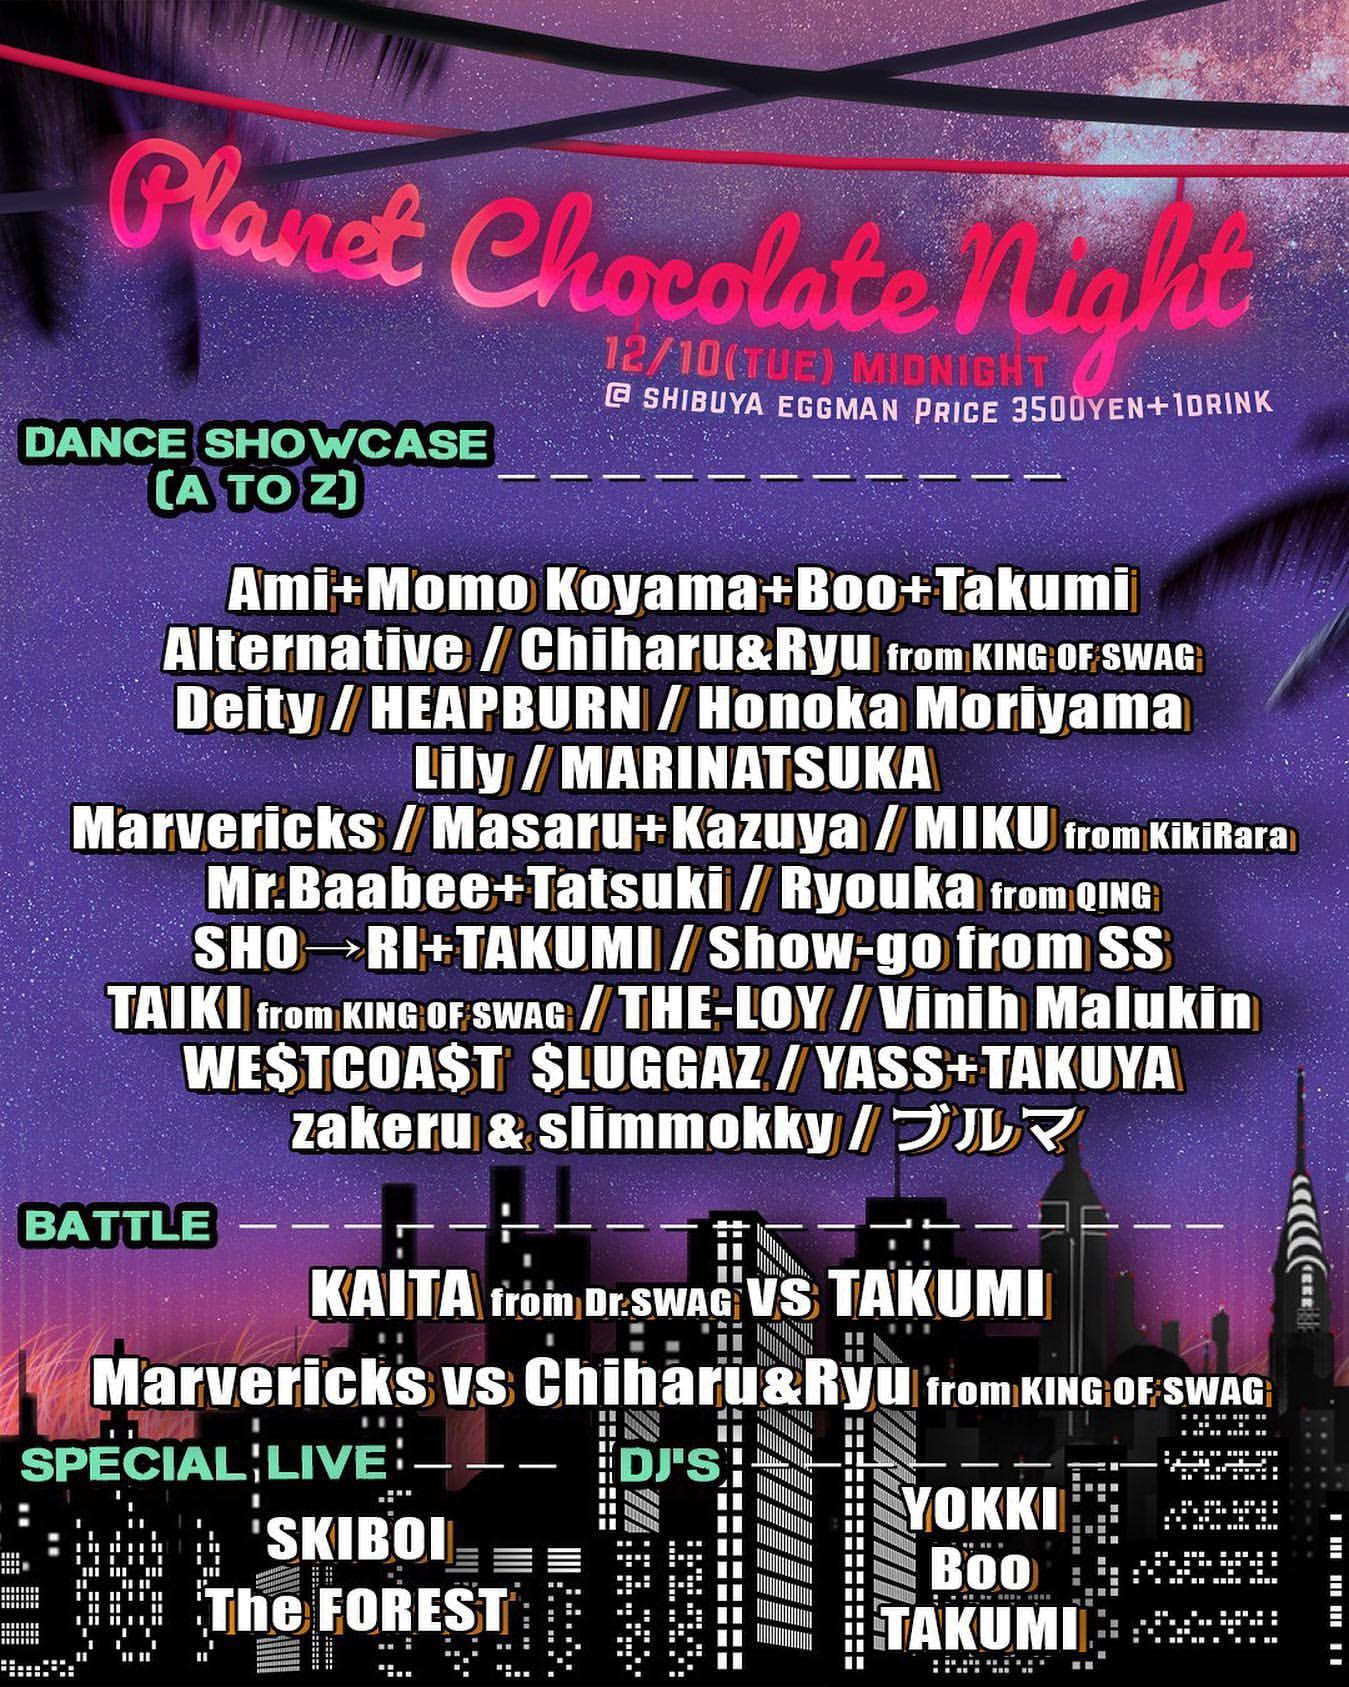 Planet Chocolate Night